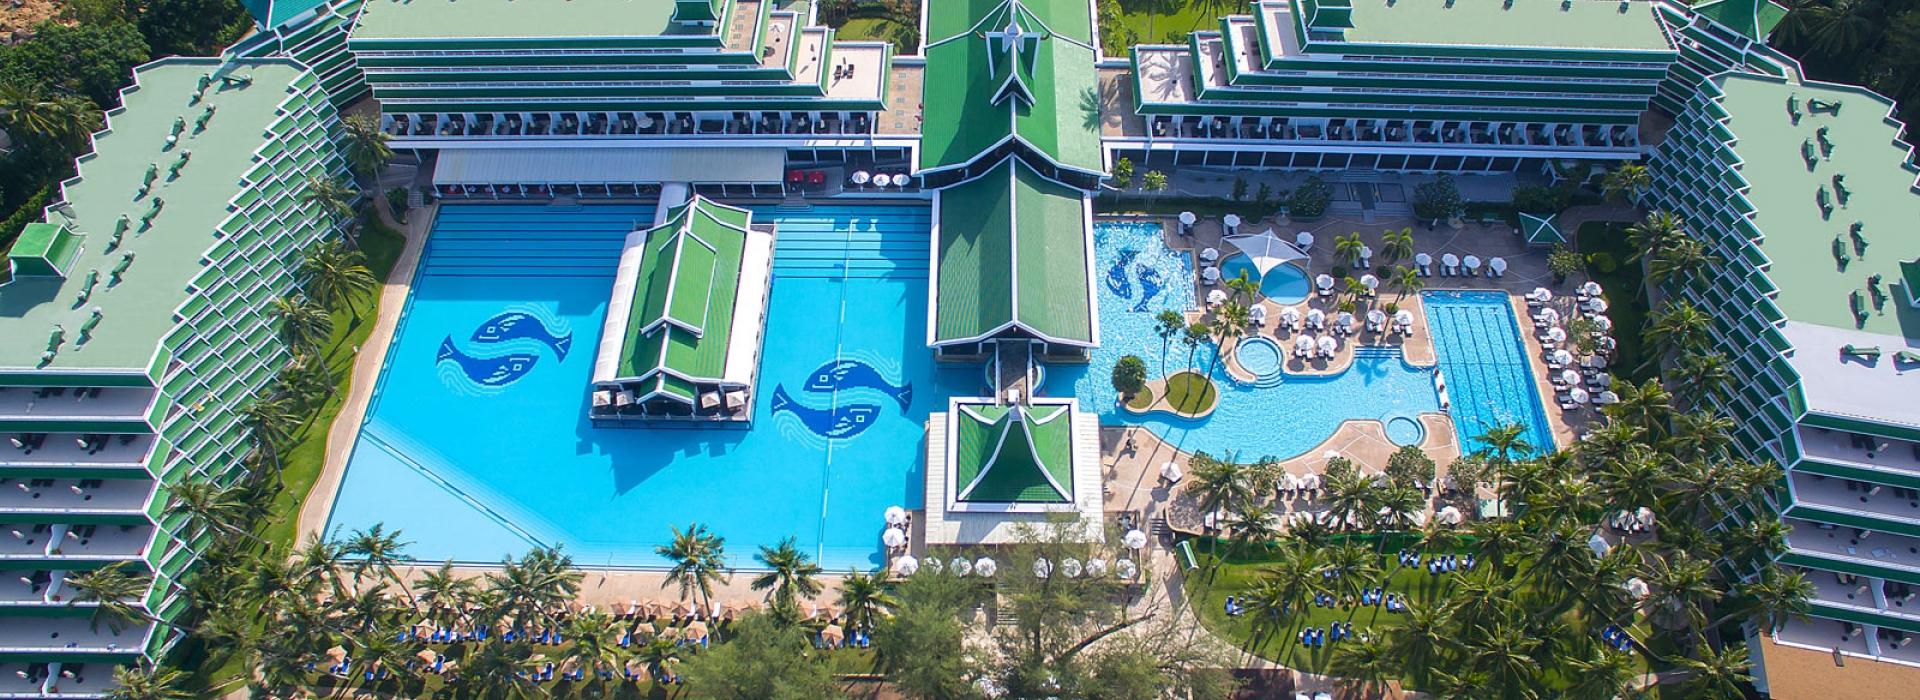 Le Méridien Phuket Beach Resort 5*